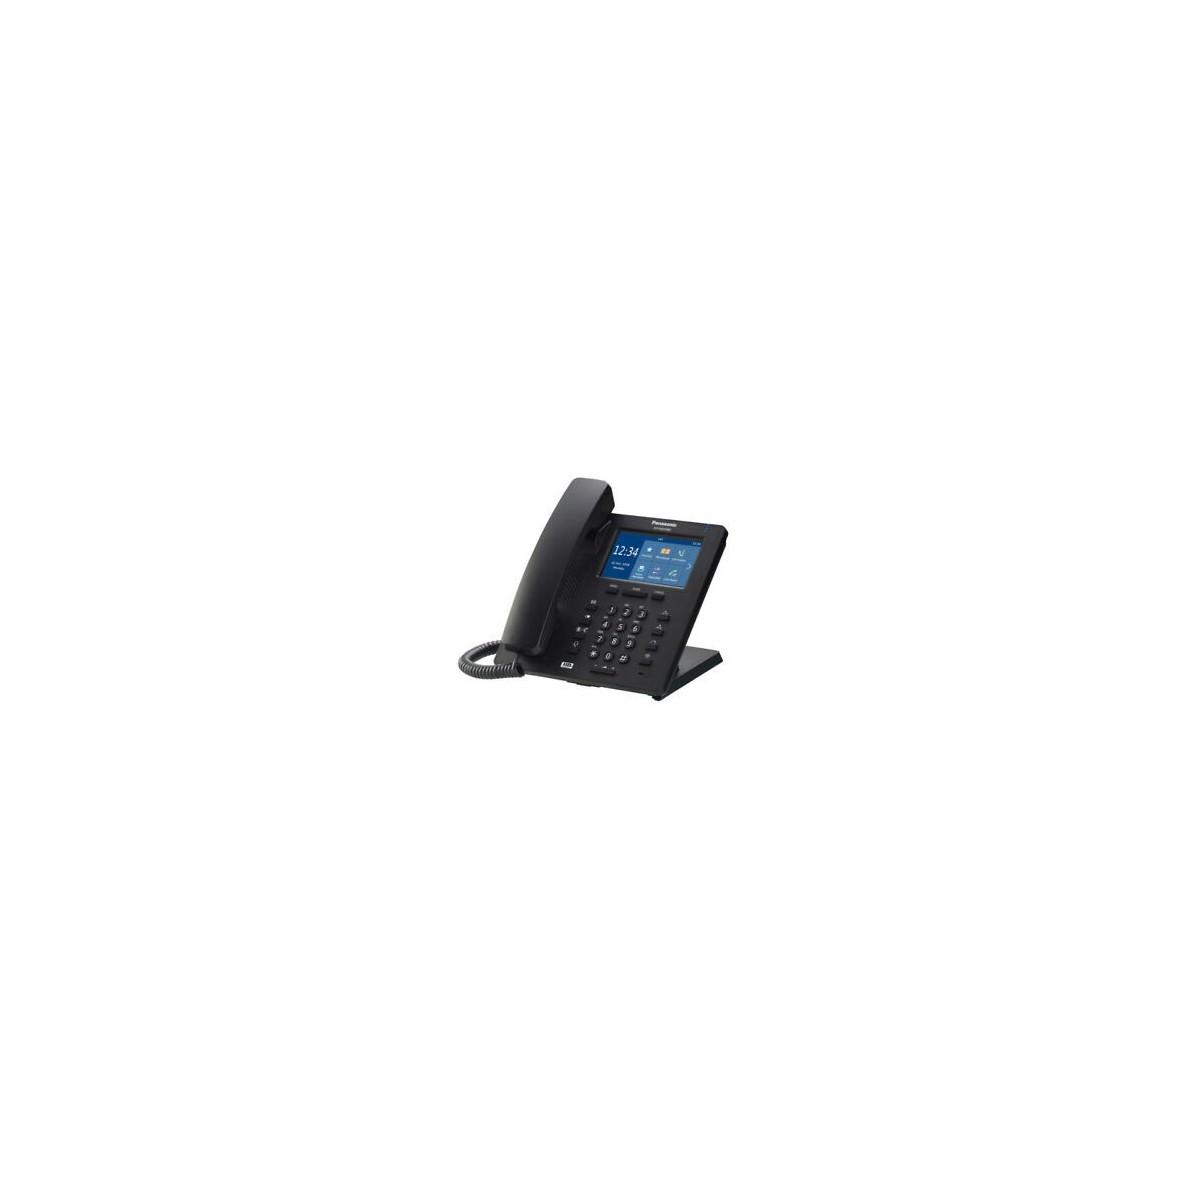 Panasonic Telefono SIP Avanzato HDV340NEB